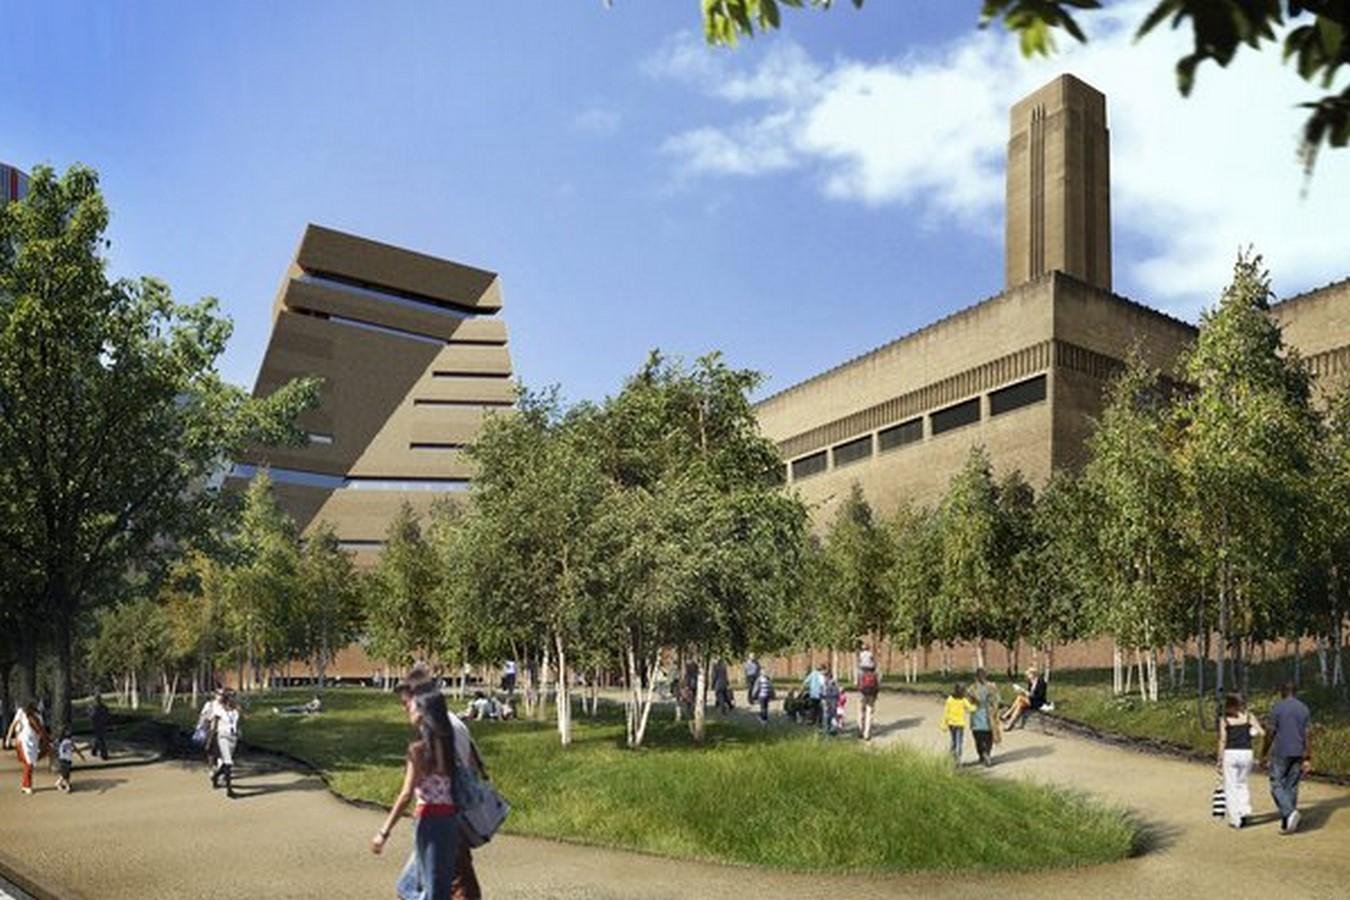 Tate Modern Switch House by Herzog & de Meuron: Model museums of the 21st century - Sheet7